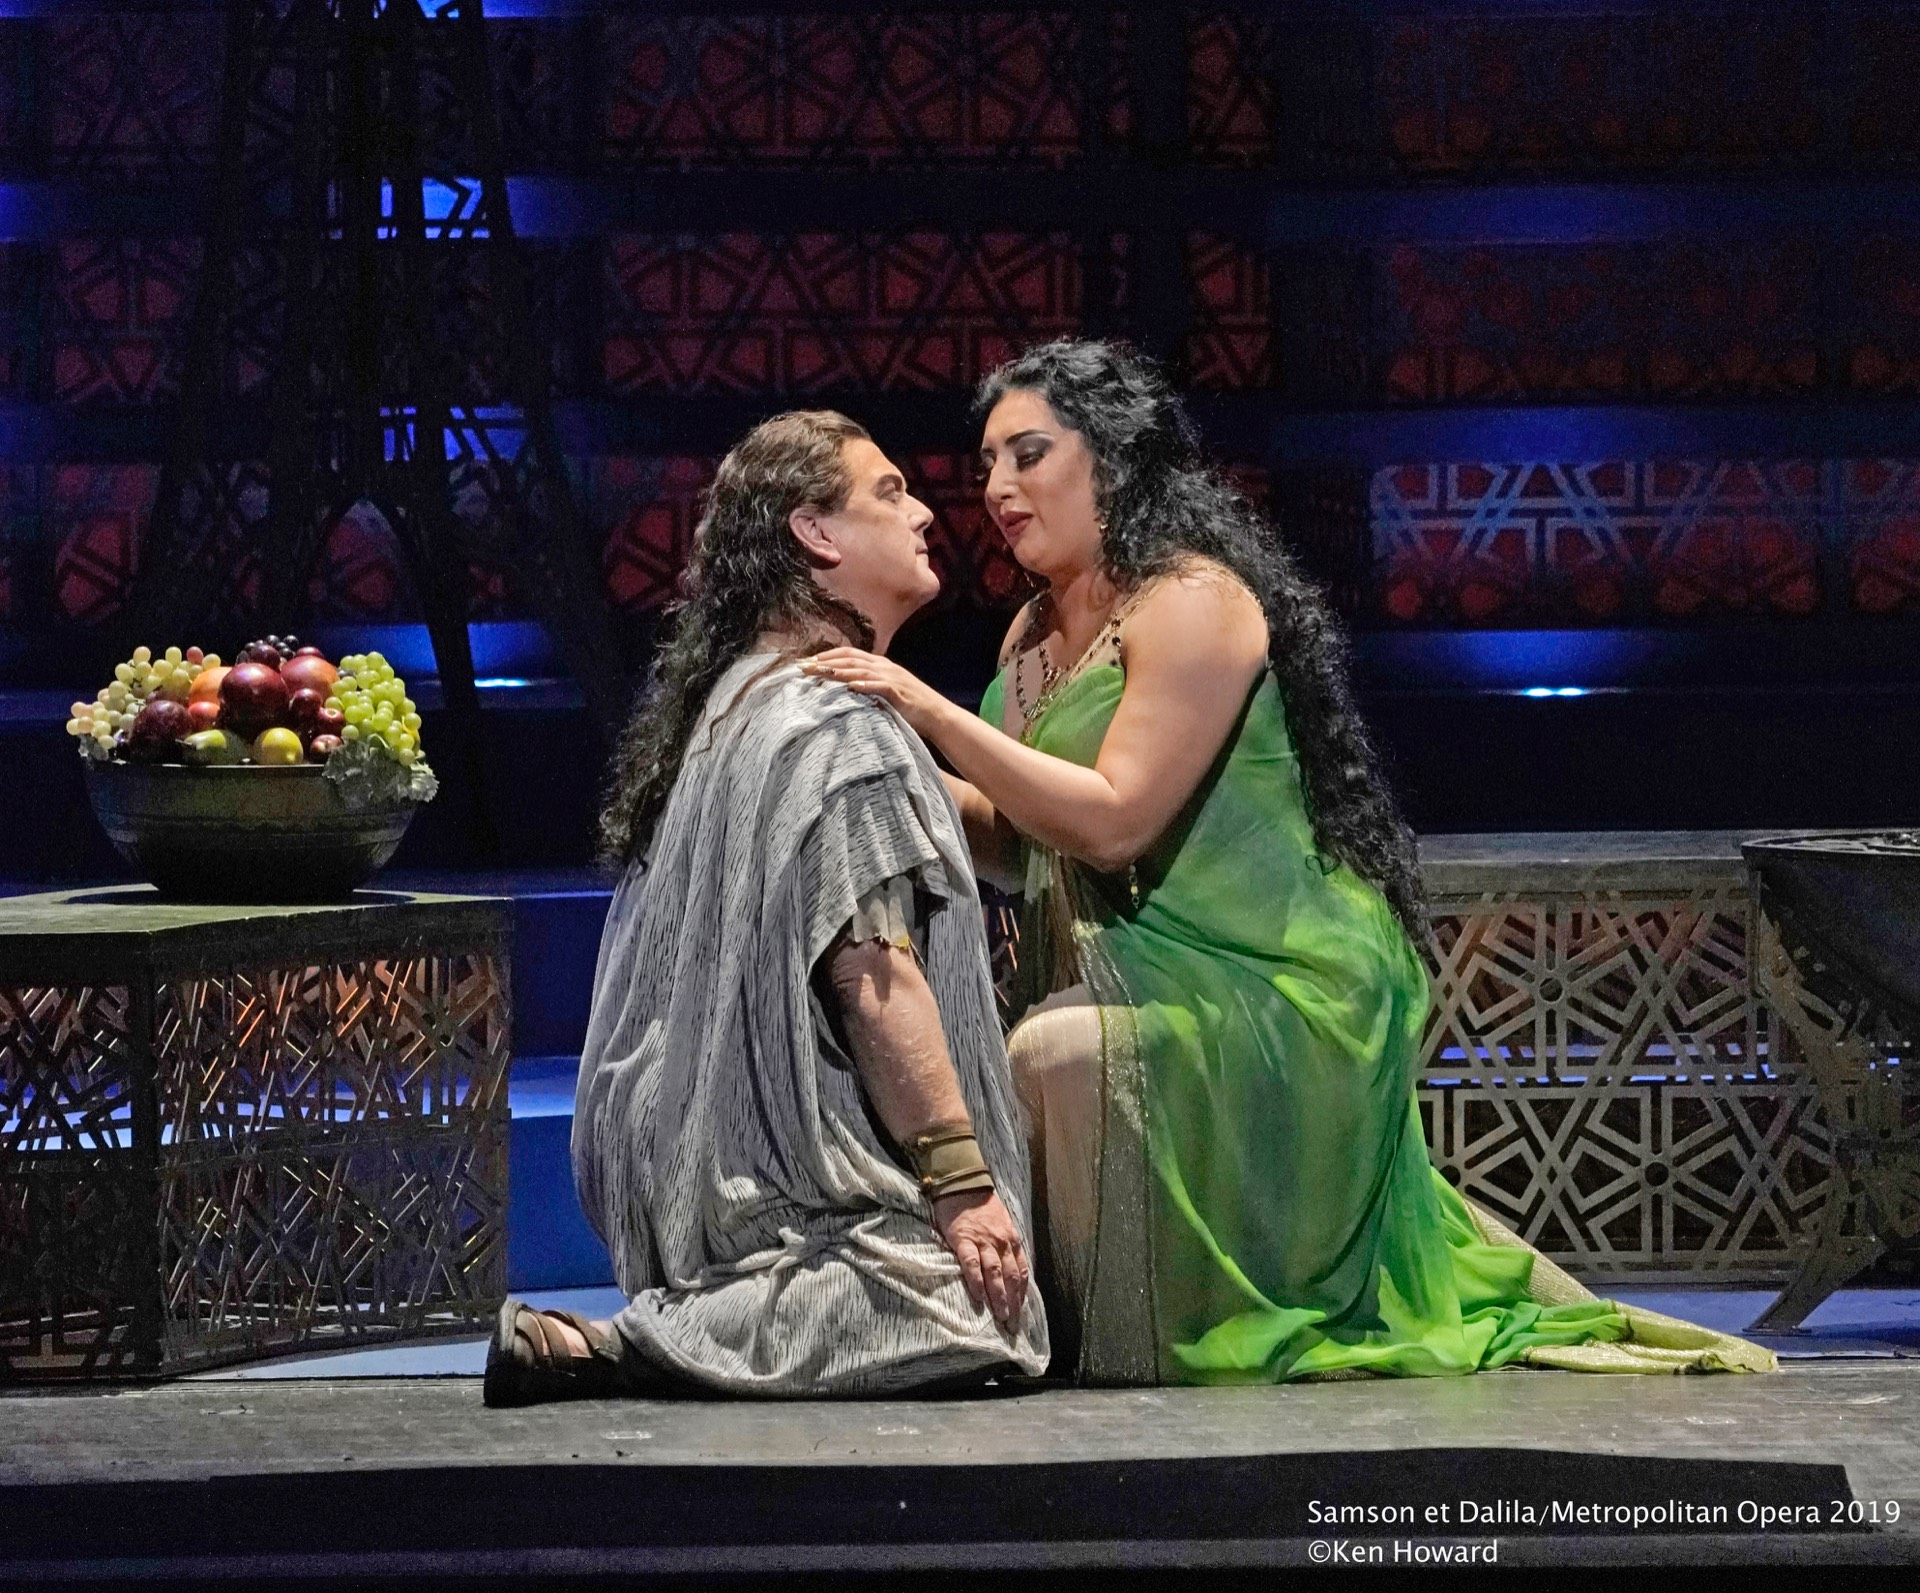 Gregory Kunde Semson et Dalila Metropolitan Opera 2